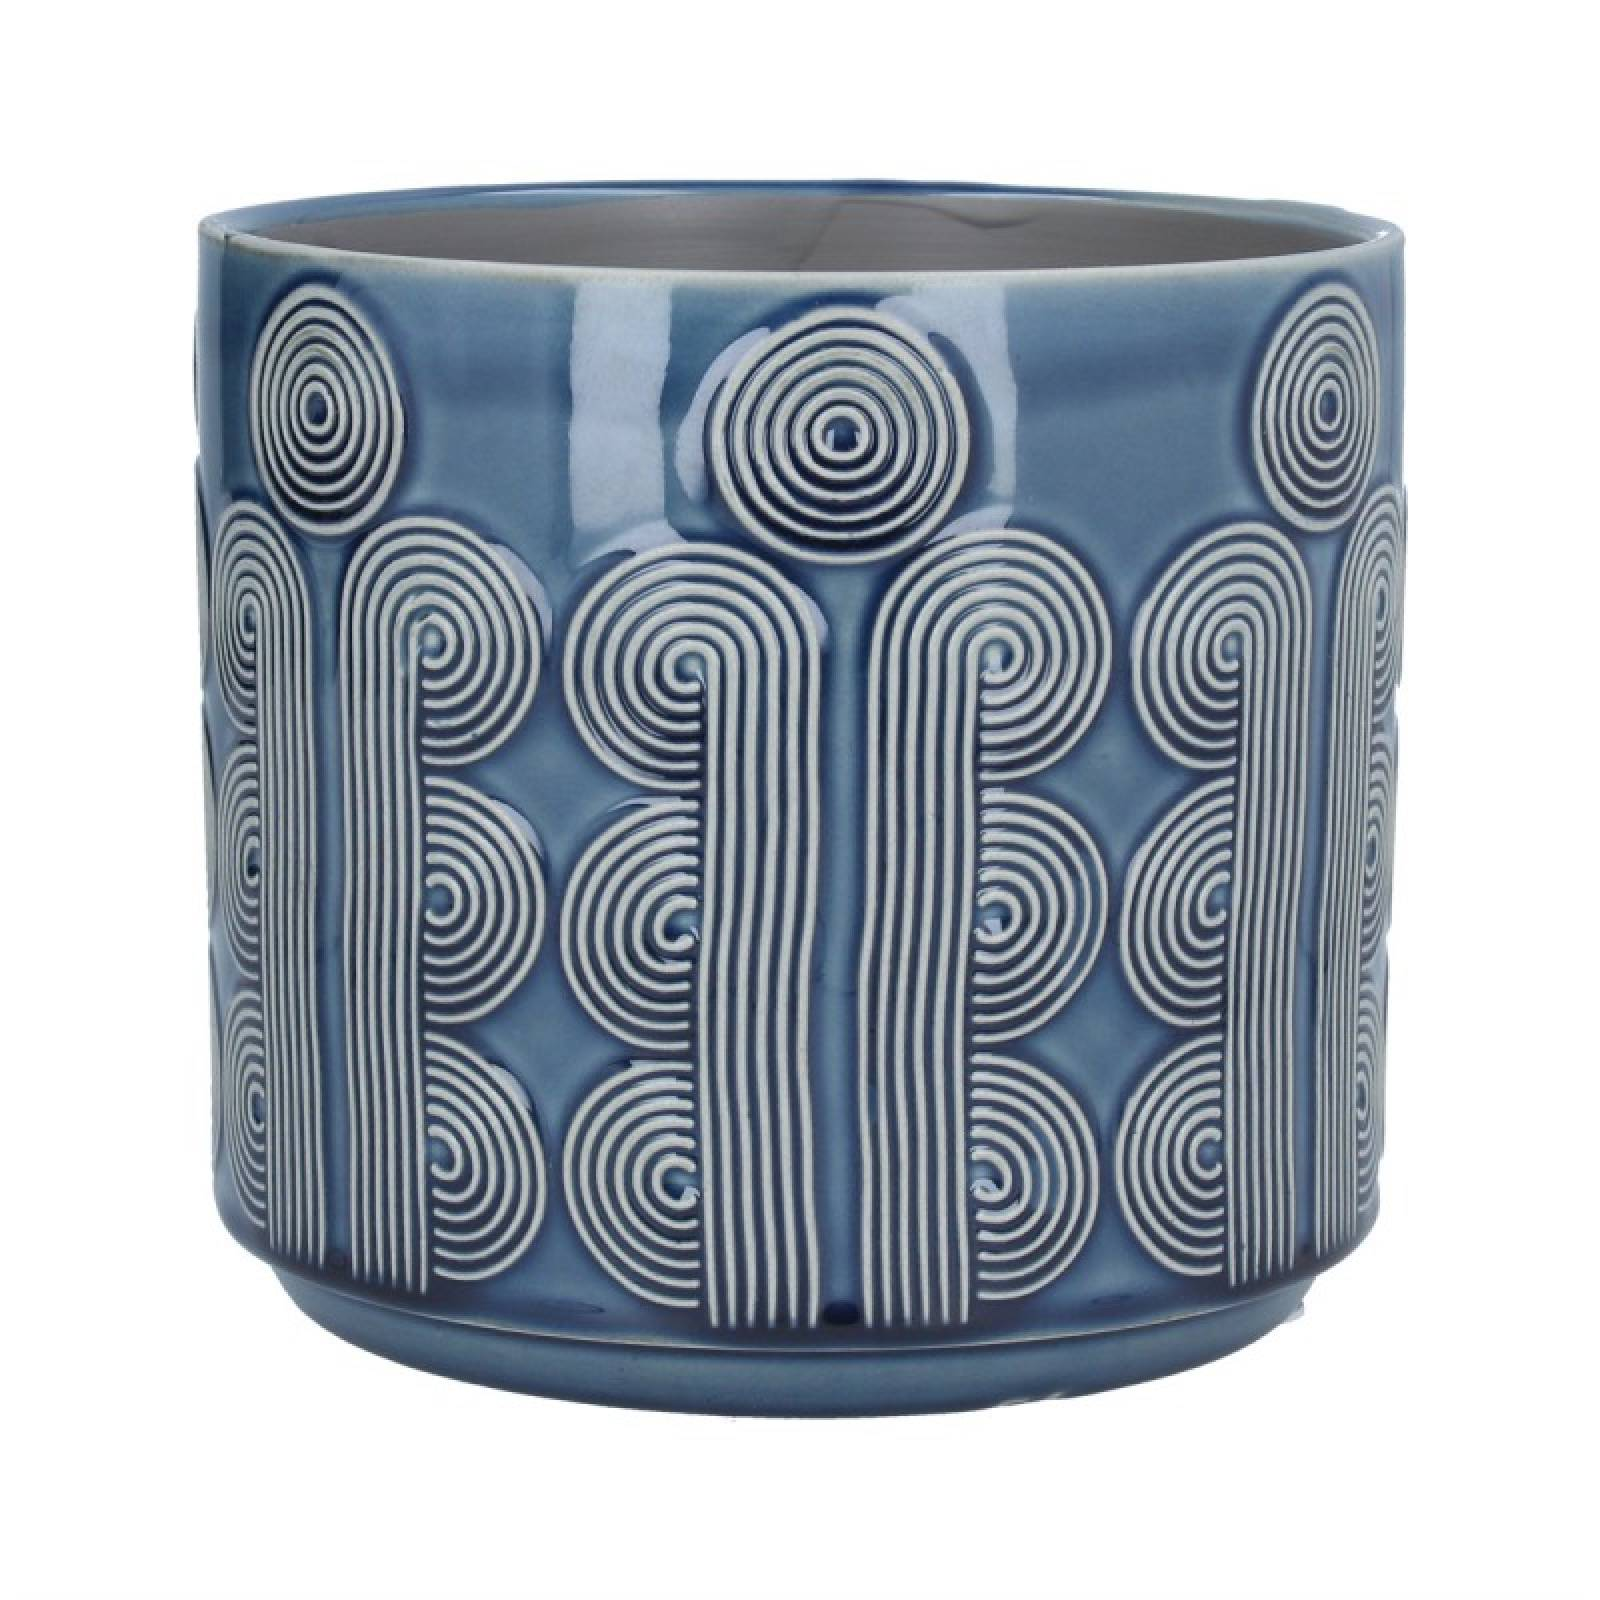 Large Retro Circles Ceramic Flowerpot Cover In Navy Blue